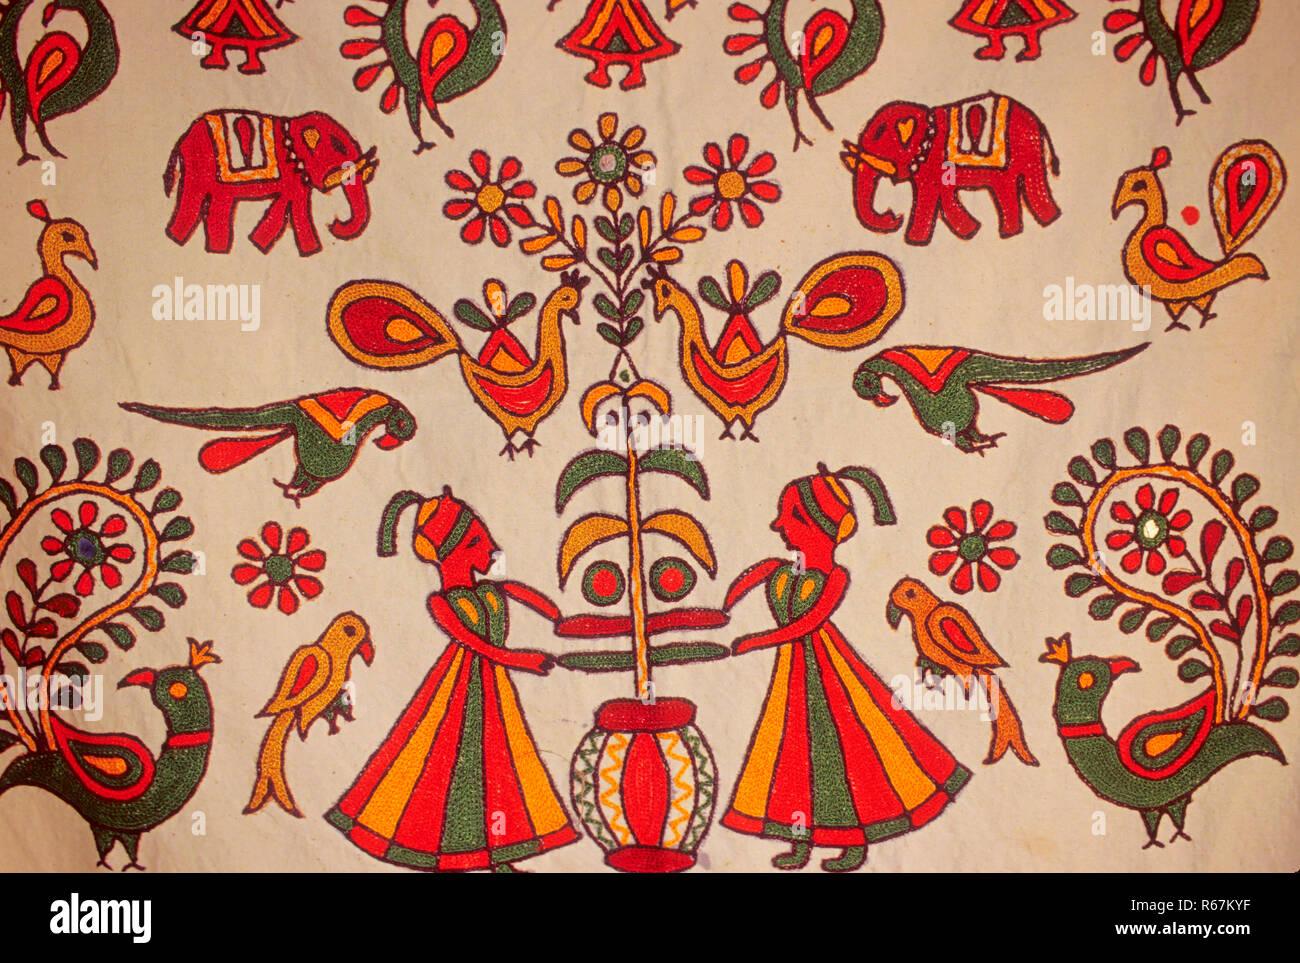 folk design on cotton cloth Stock Photo